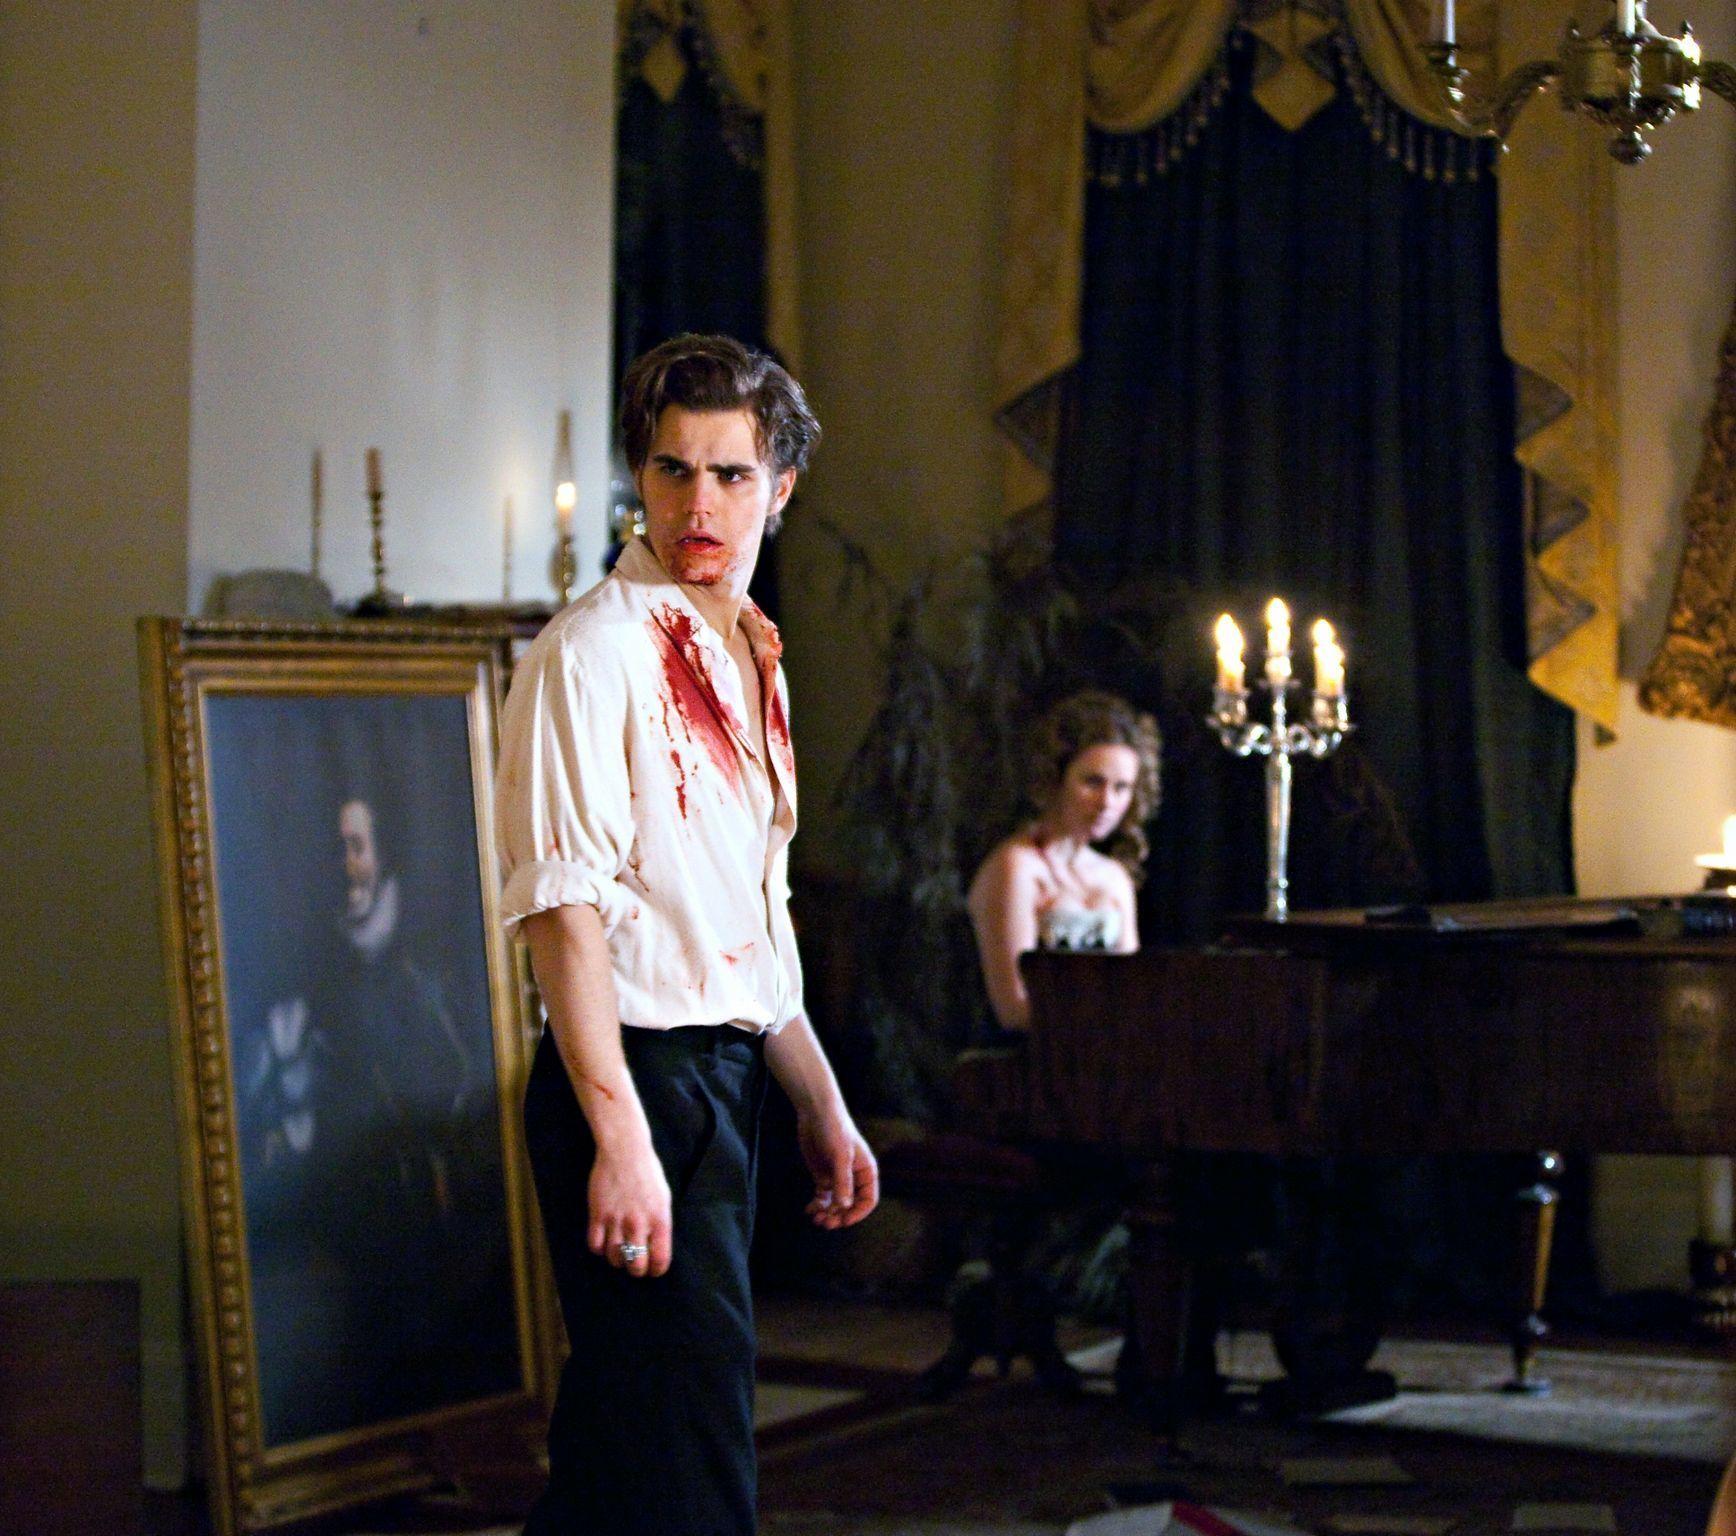 TVD_2x15_The Dinner Party_Episode stills